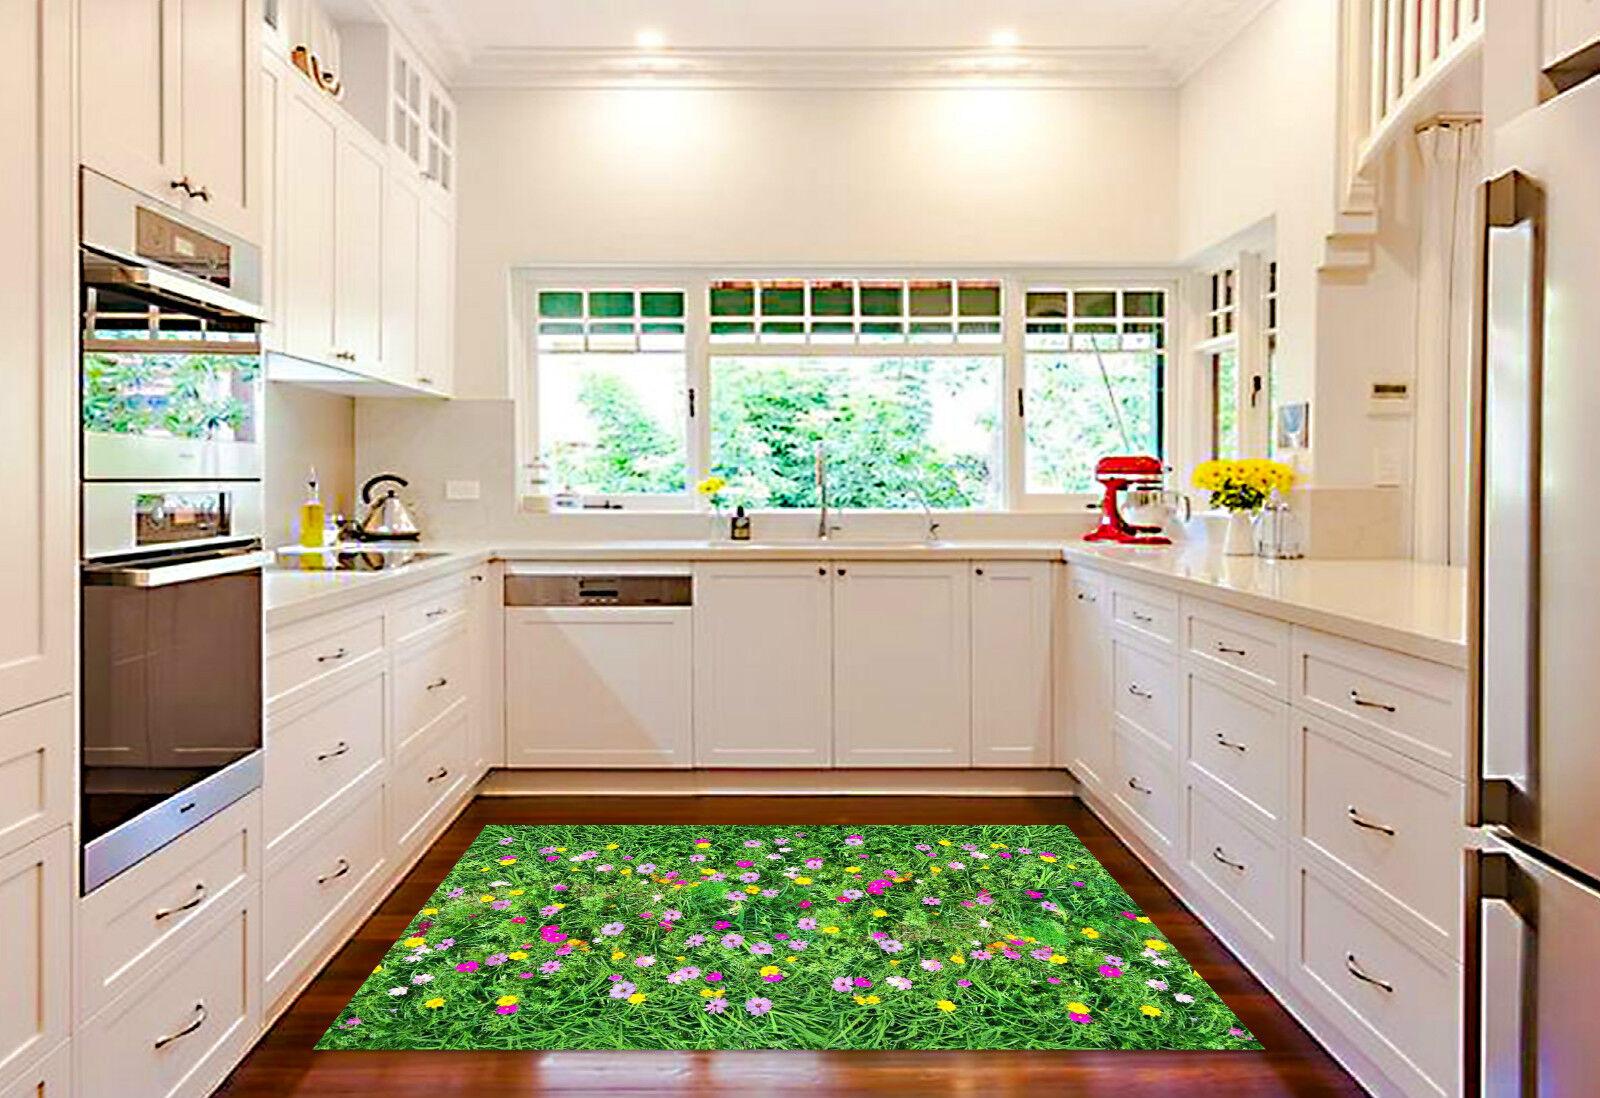 3D Flowers Grass Kitchen Mat Floor Murals Wall Print Wall Deco AJ WALLPAPER CA